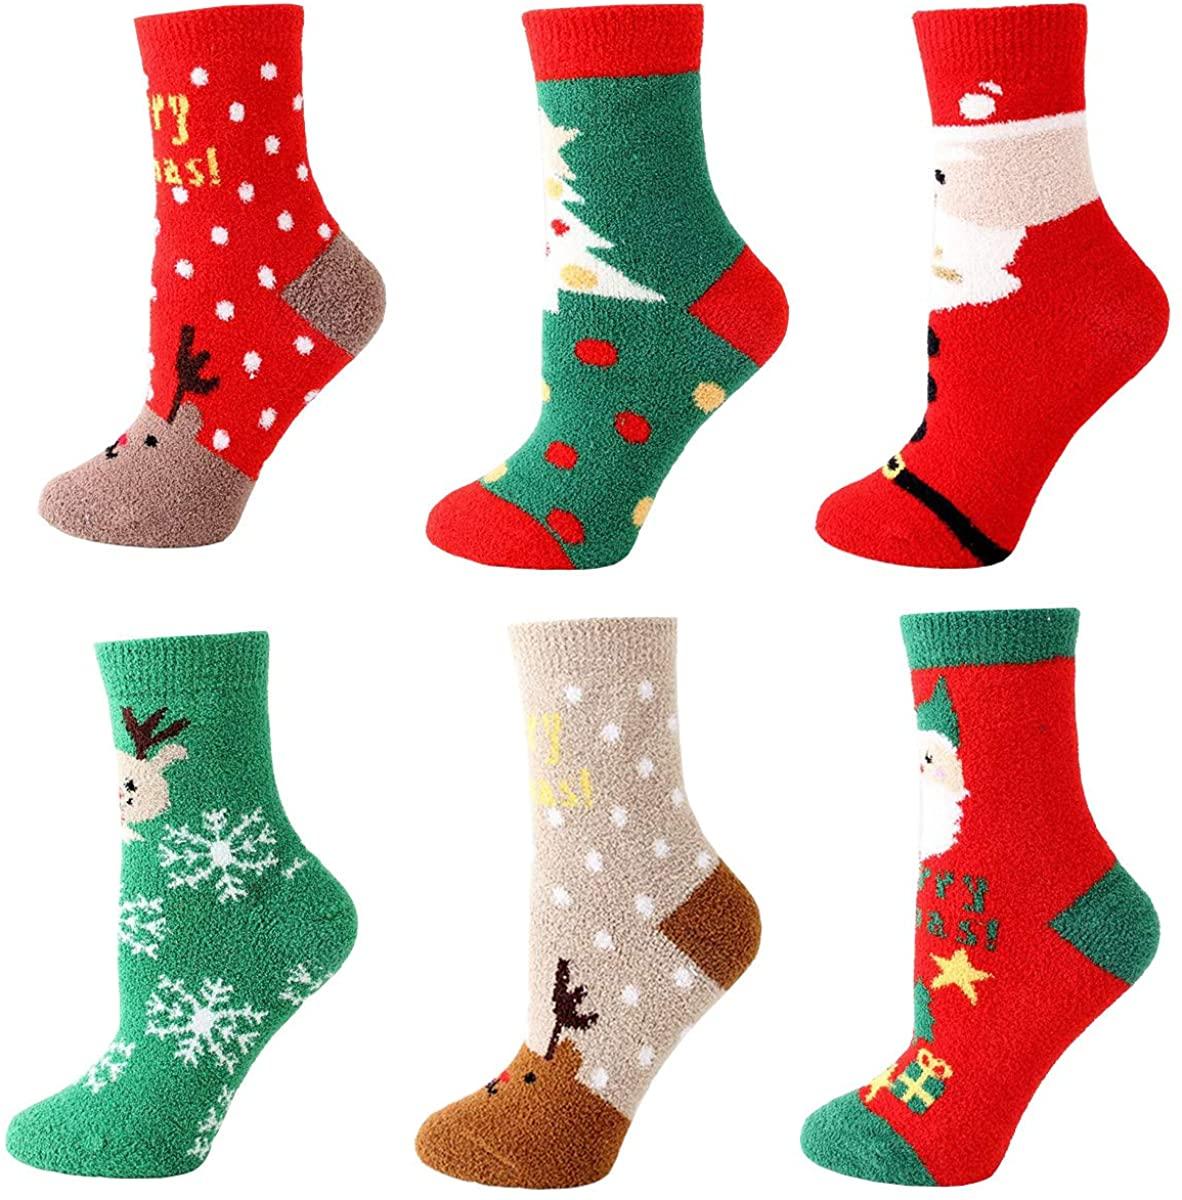 Christmas Unisex-adult Funny Novelty Winter Socks 6 Pack